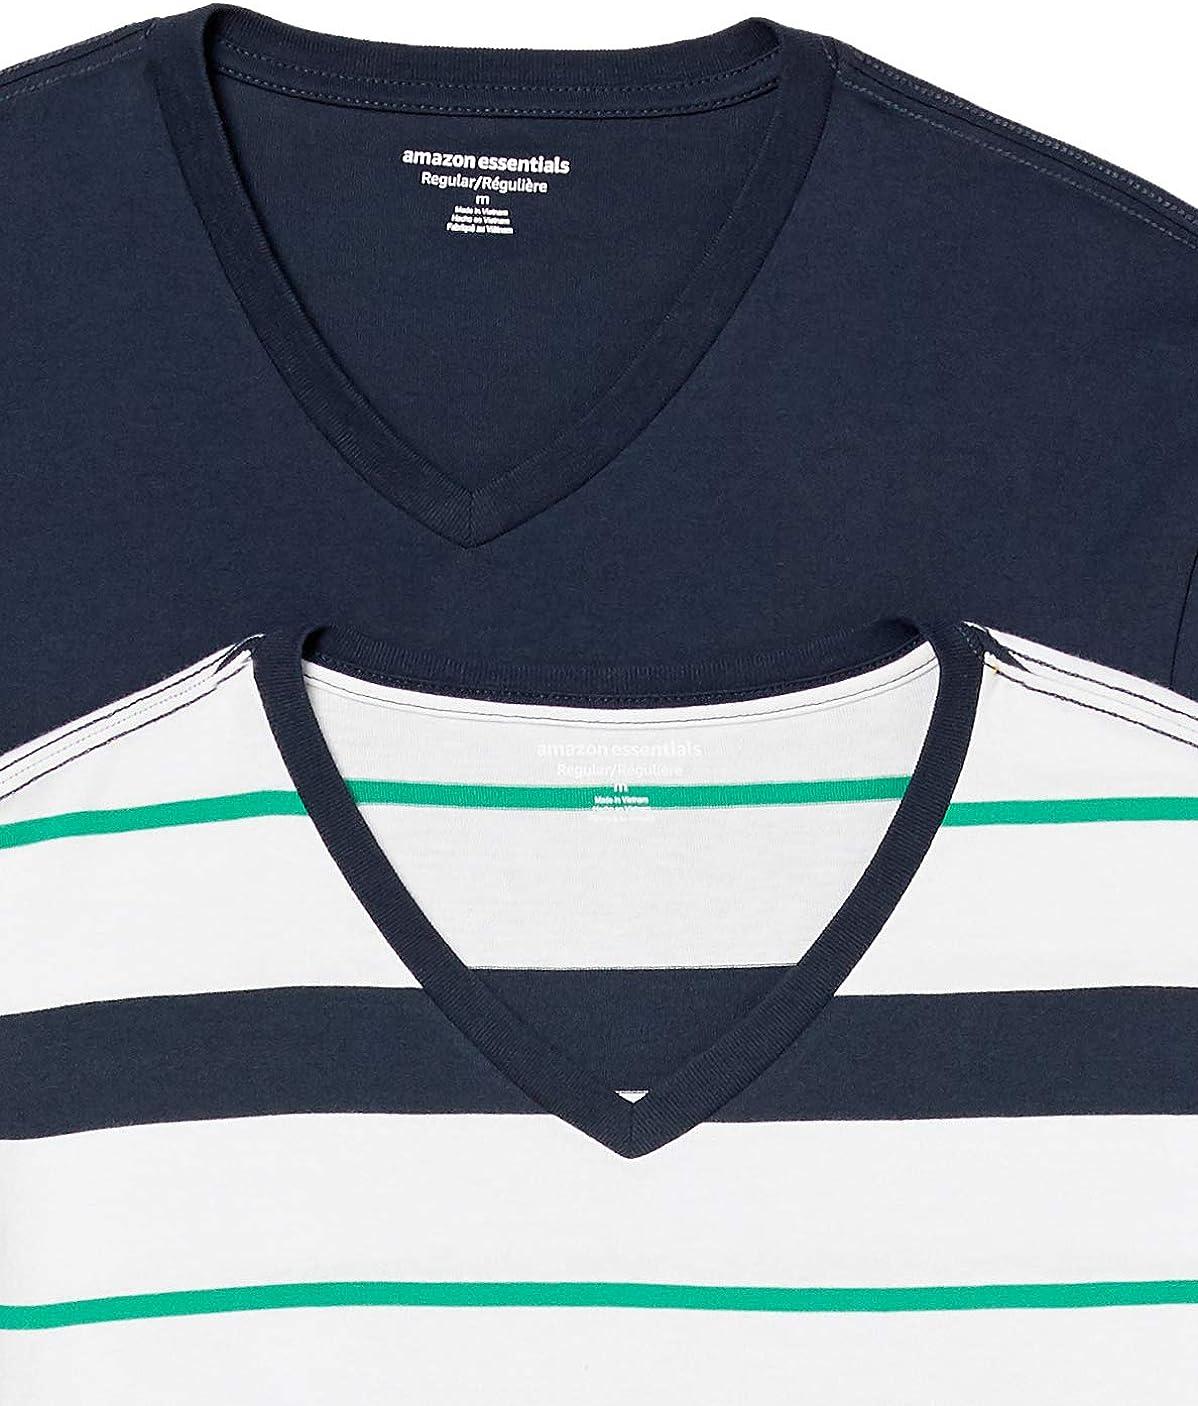 Essentials 2-Pack Loose-fit V-Neck T-Shirt Fashion-t-Shirts Hombre